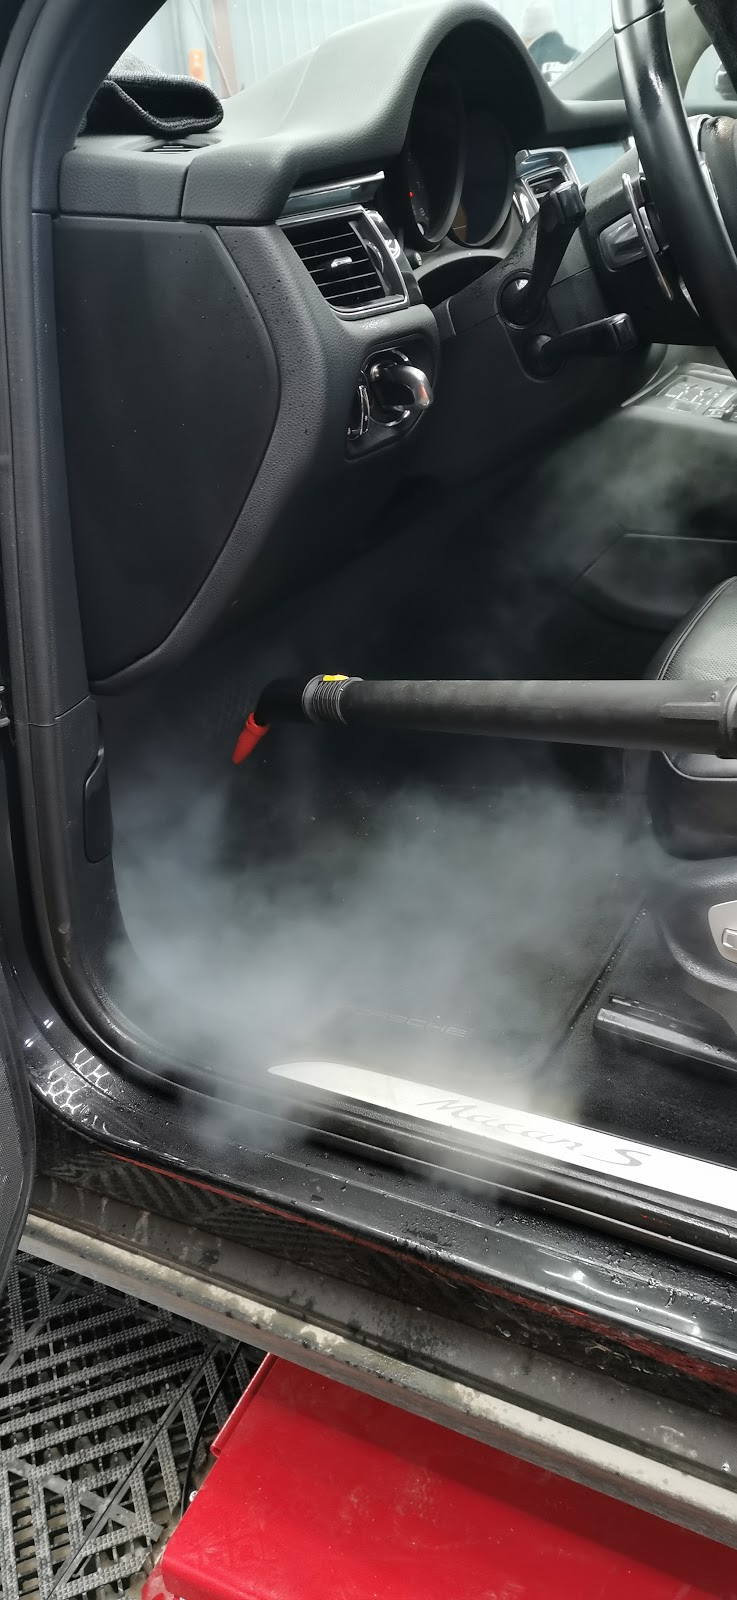 DRS Auto inc | car repair | 9575 Avenue Illinois 600 & 602, Brossard, QC J4Y 3A5, Canada | 5146915189 OR +1 514-691-5189